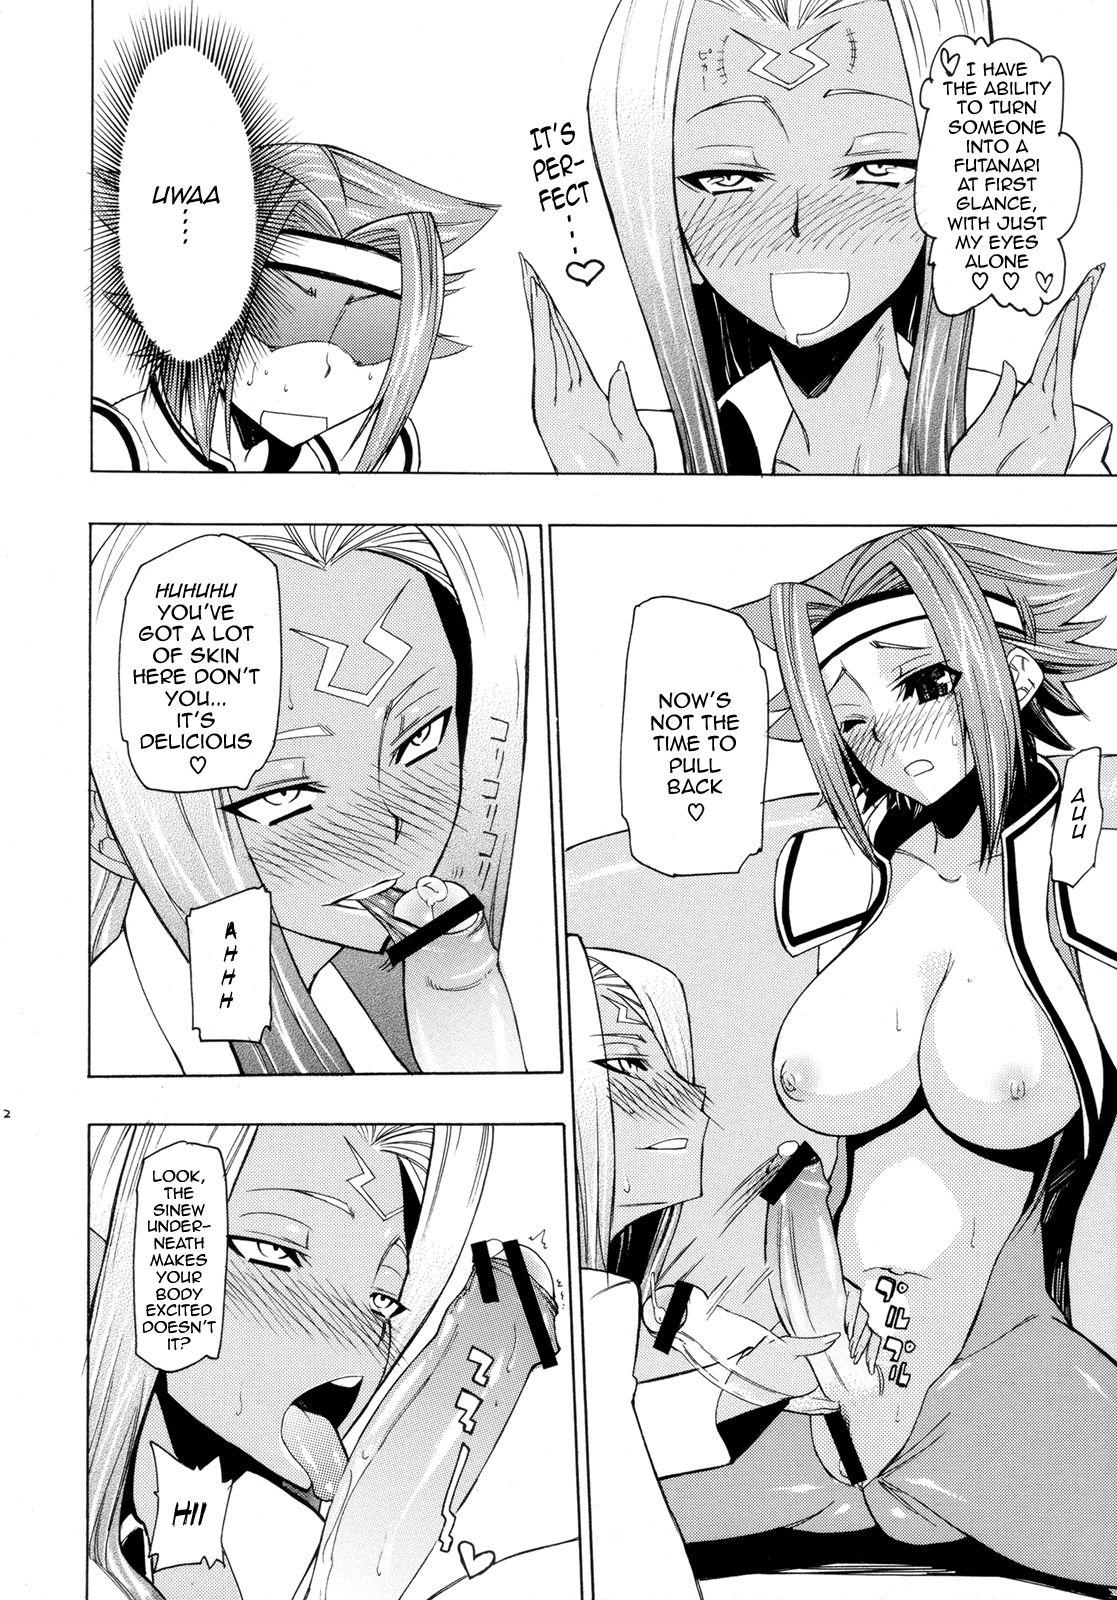 Rakshata-san no Ganbou 12